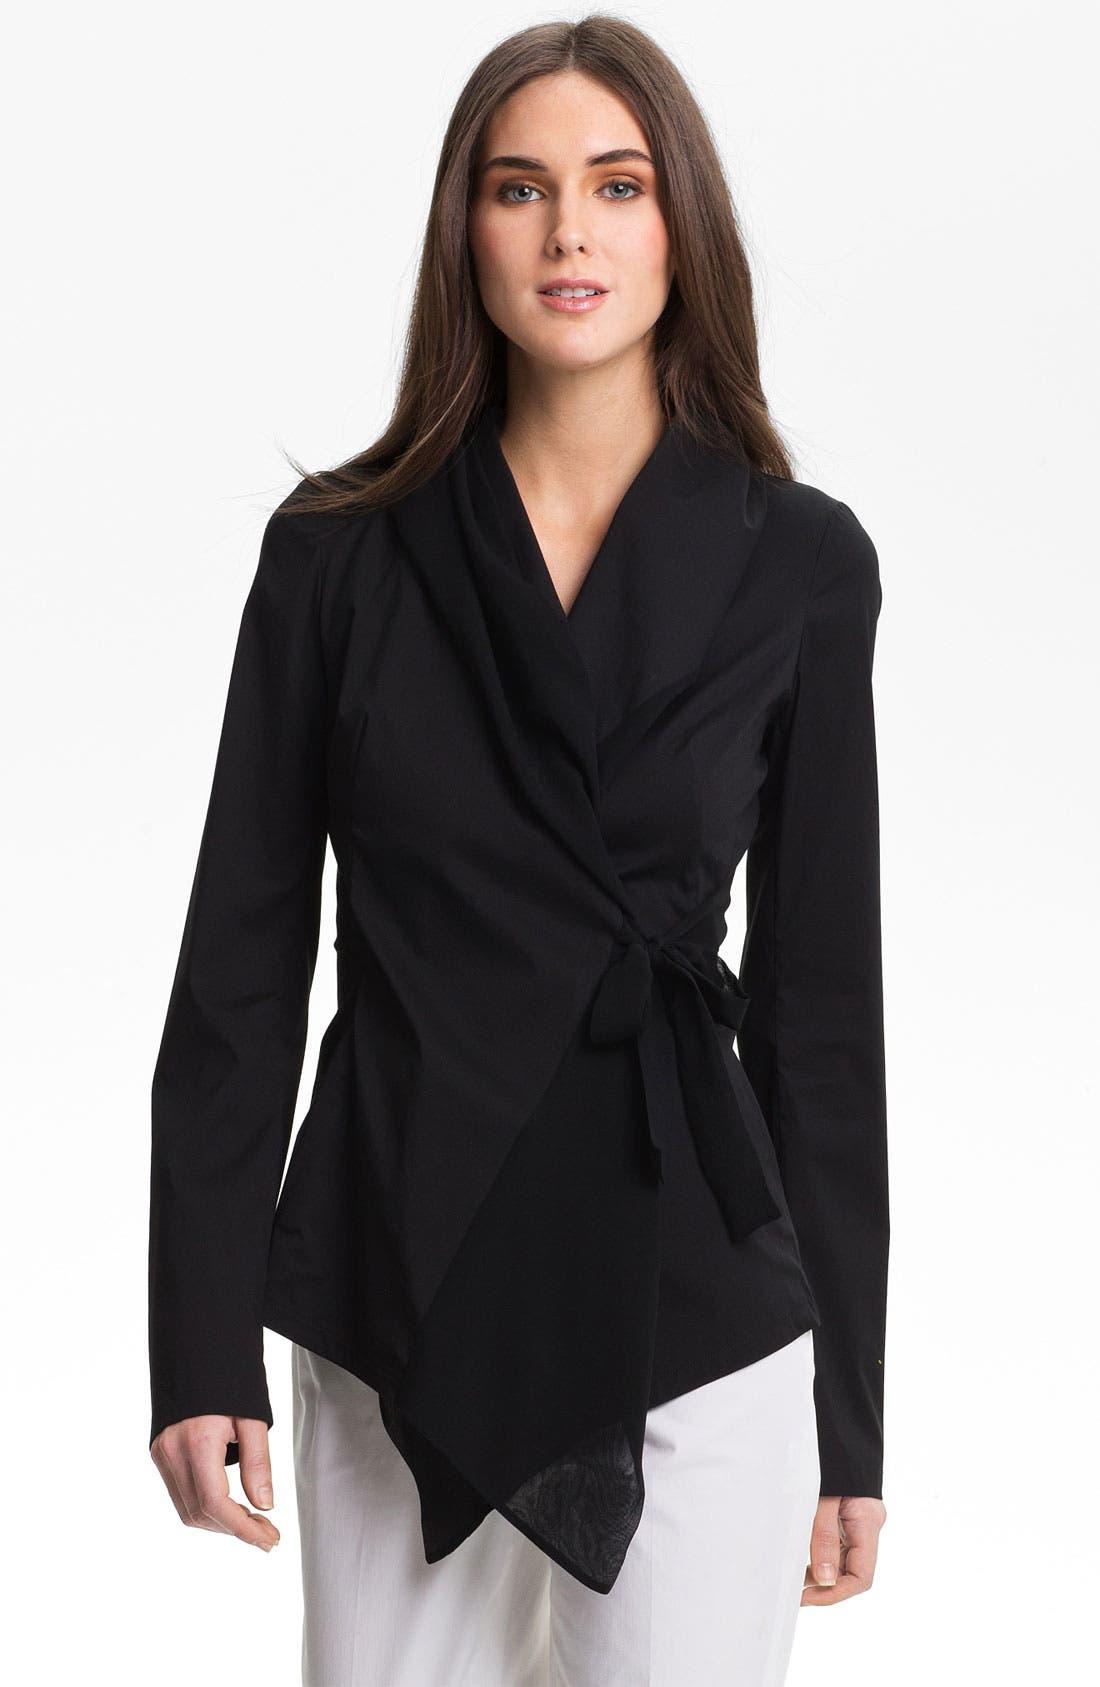 Alternate Image 1 Selected - Lafayette 148 New York 'Bethany' Italian Stretch Cotton Blend Jacket